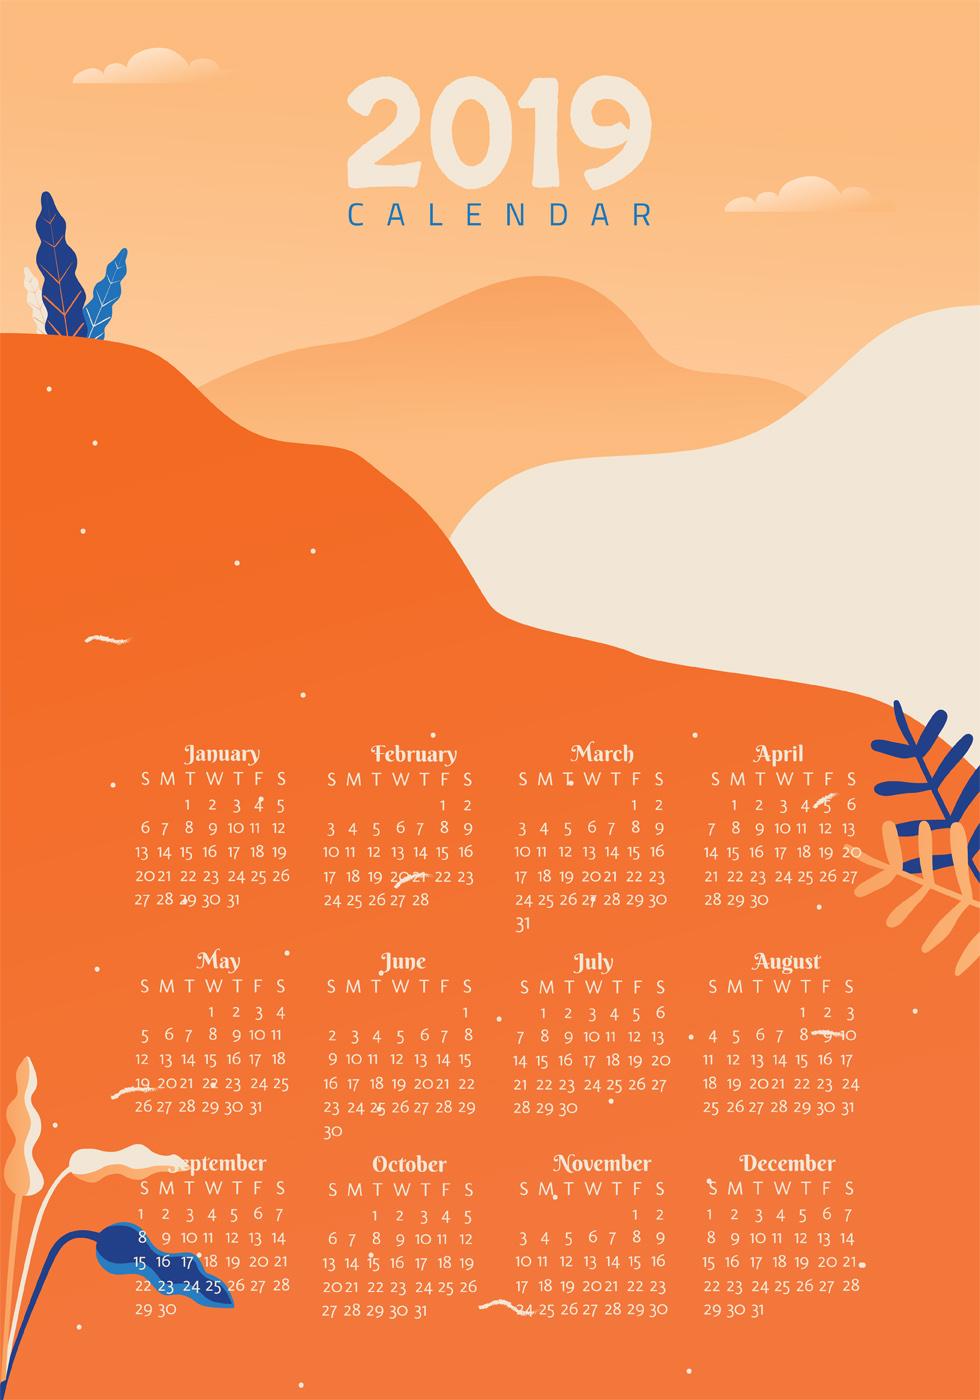 2019 calendar printable monthly